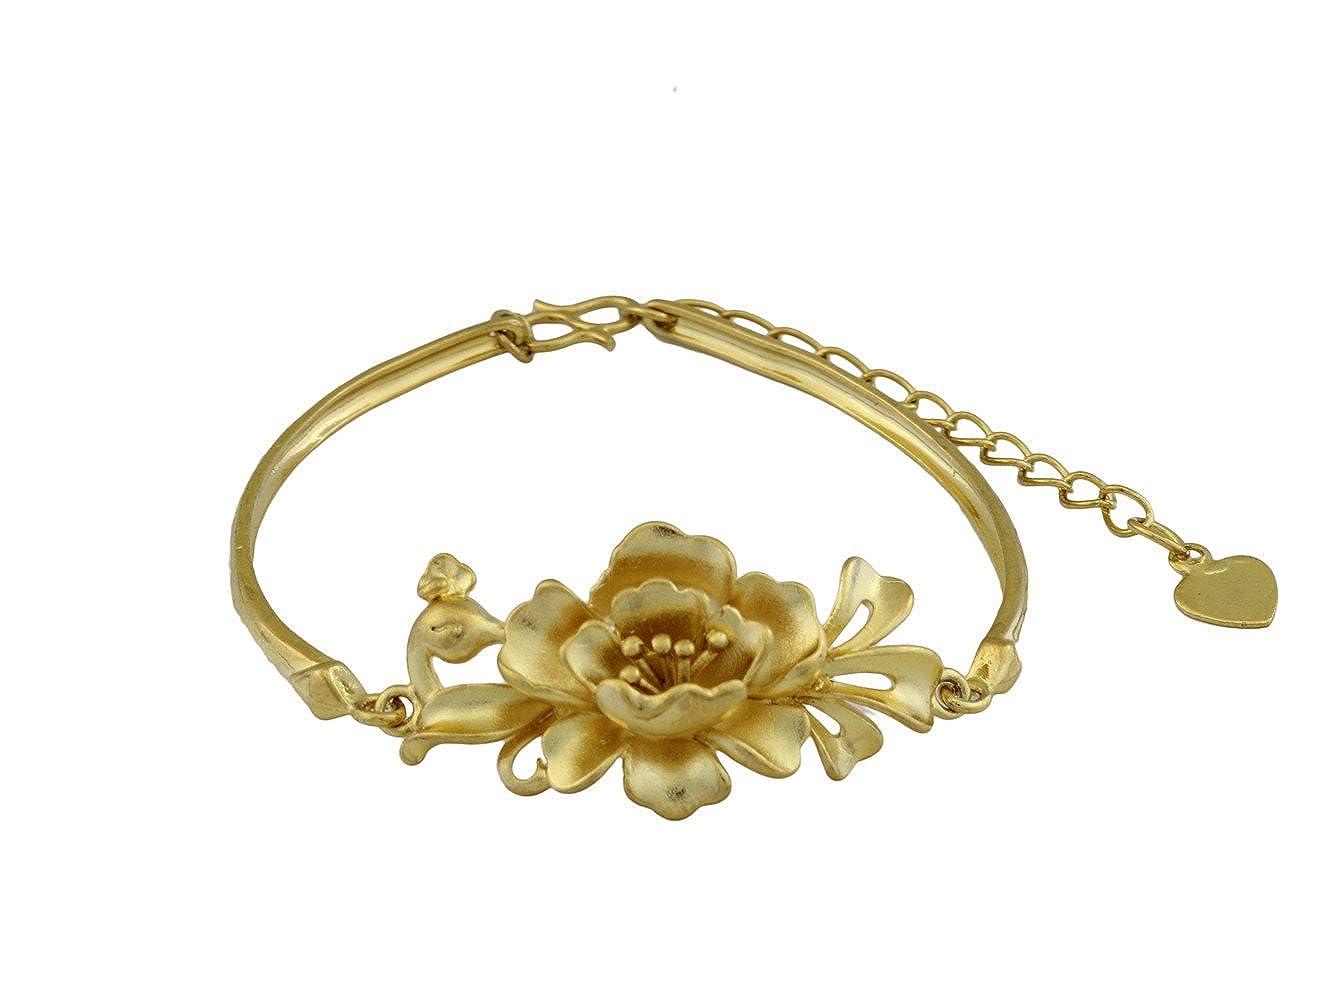 dokreil Big Flower Yelow Gold Engraved Bangle Bracelet